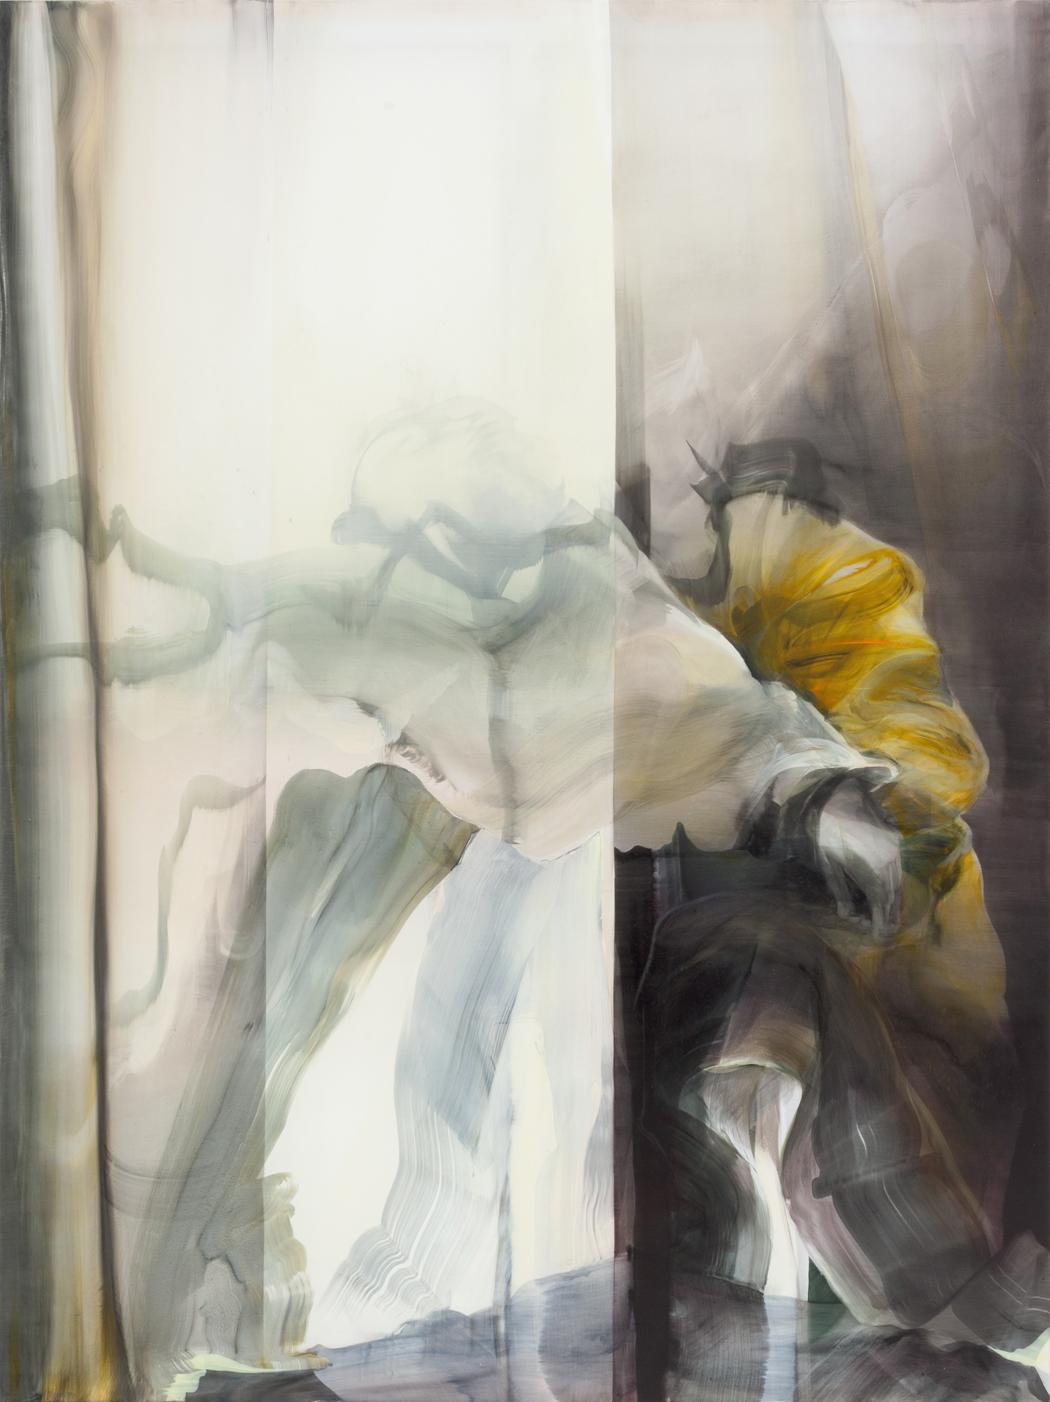 Almond Joy VI, 2015, Öl auf Nylon, 200 x 150 cm